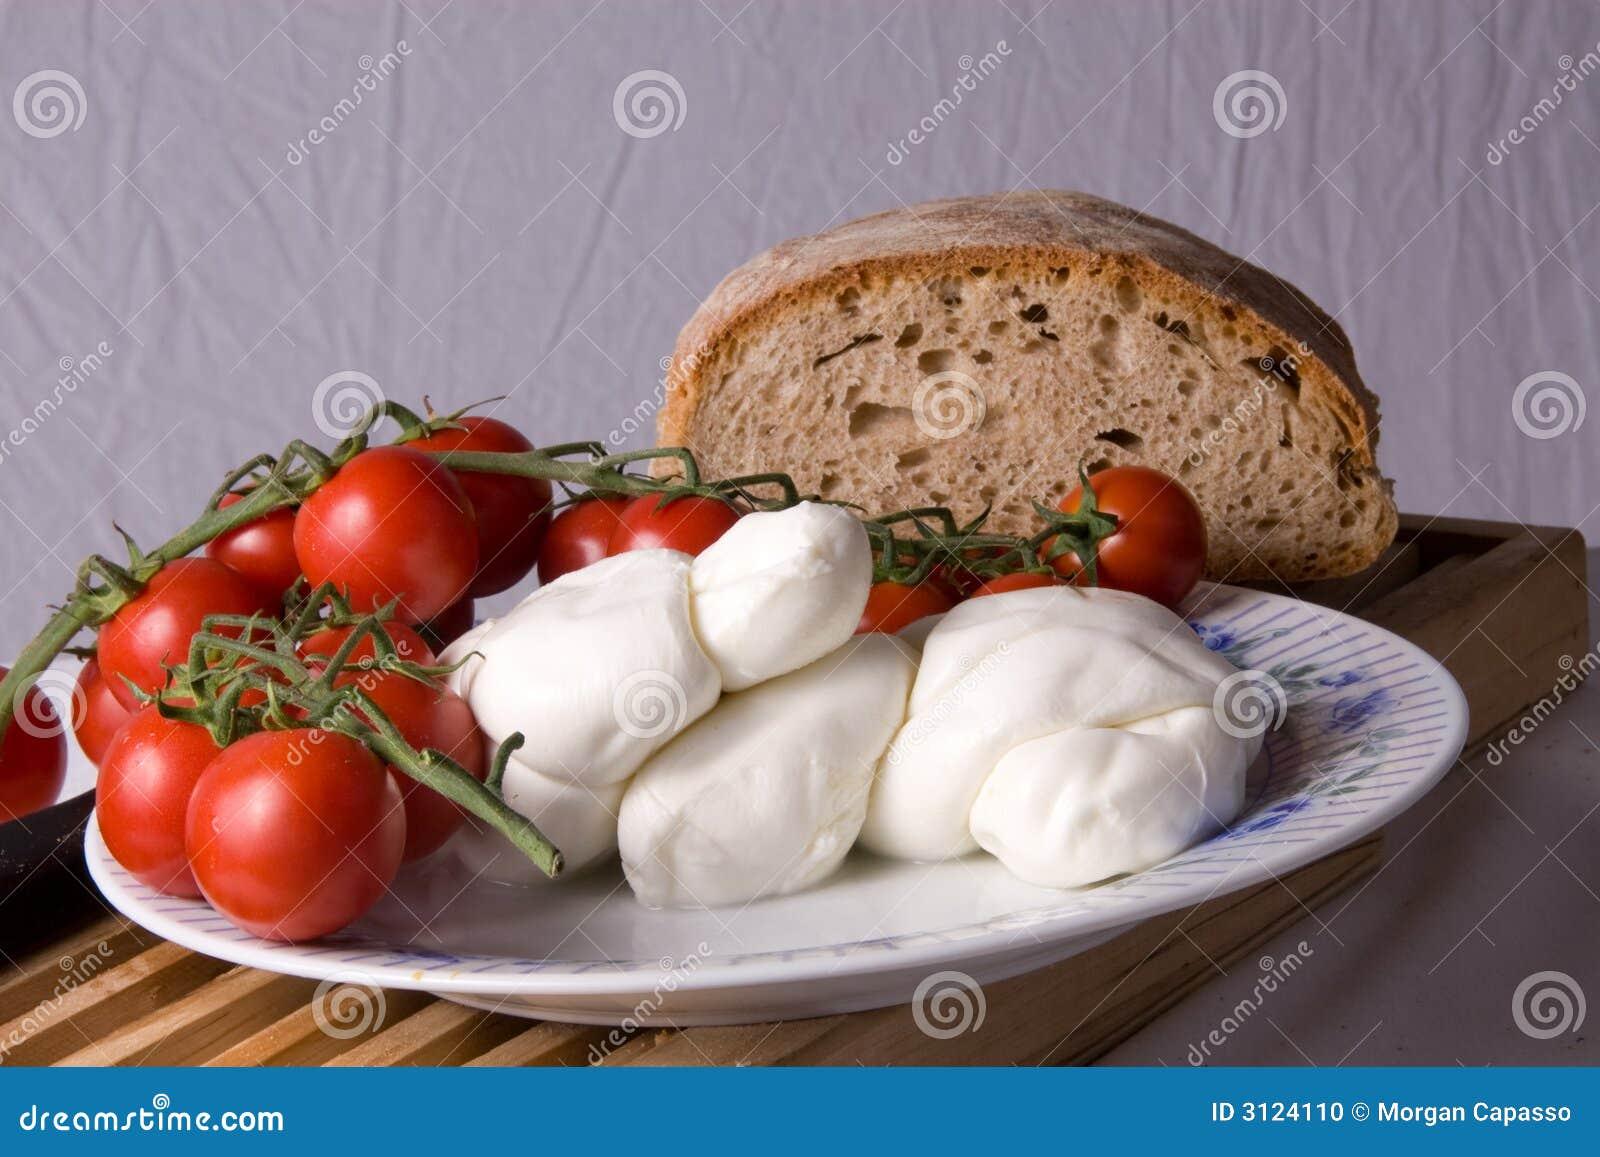 to make a simple salad called caprese. Fresh mozzarella and plum ...